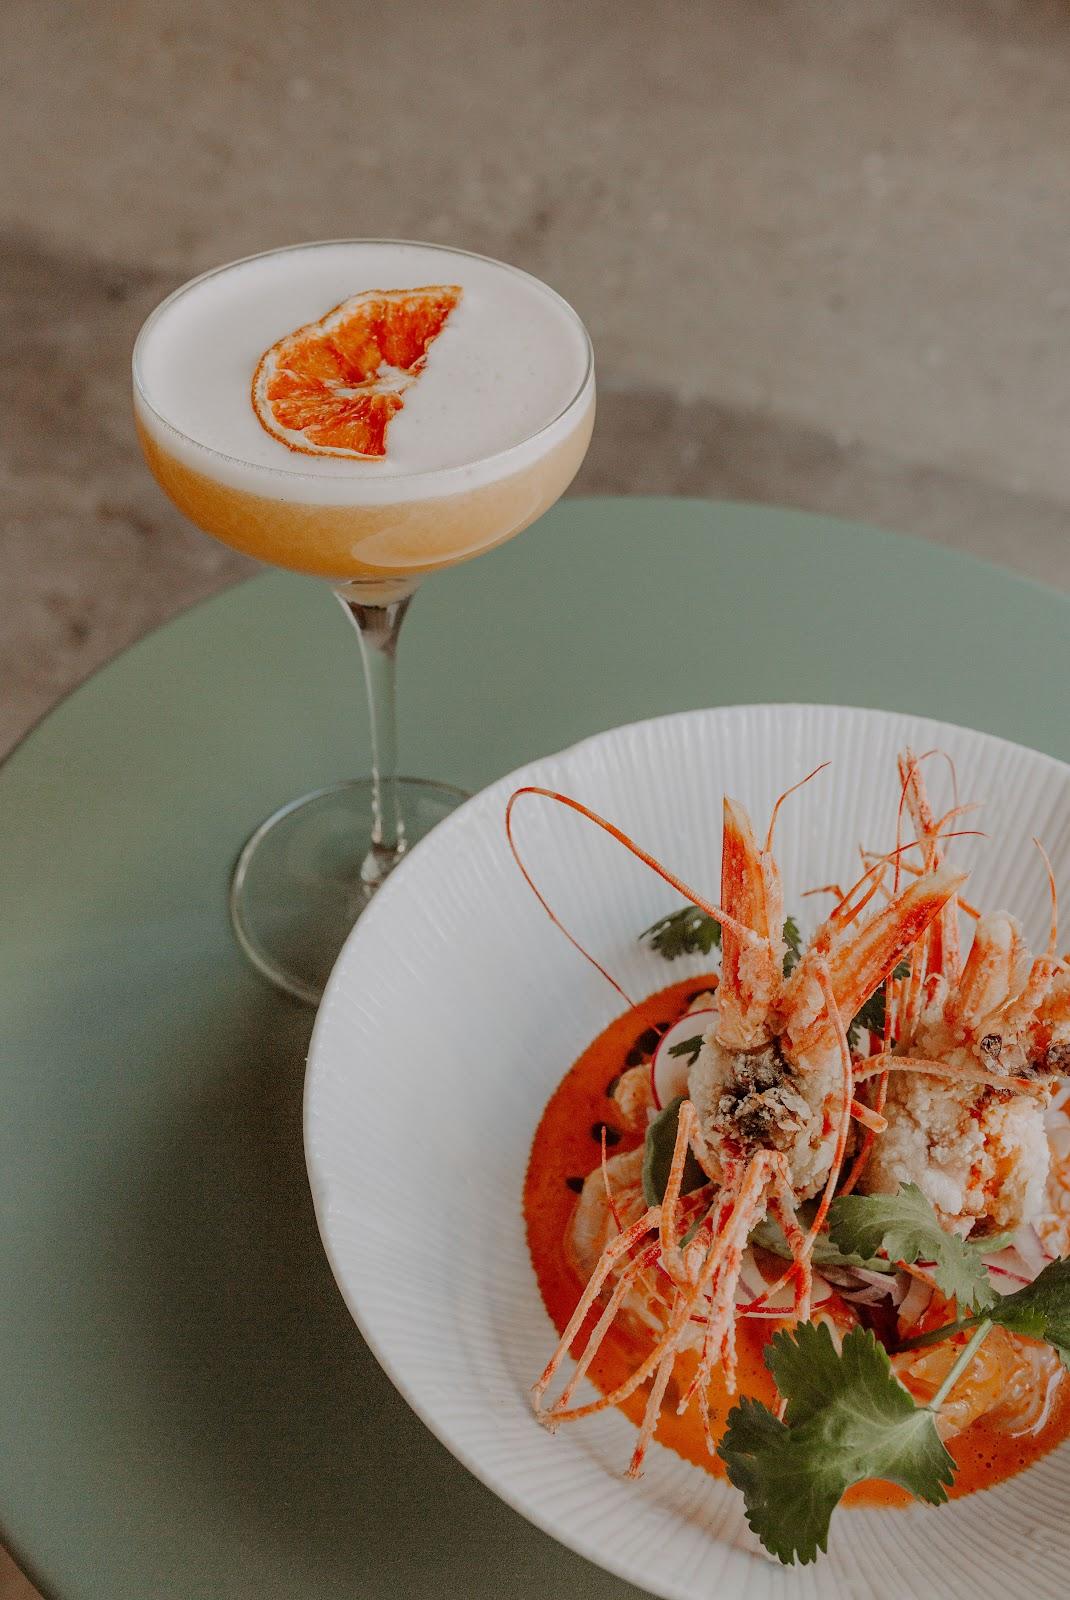 Grapefruit margarita next to plate of shrimp